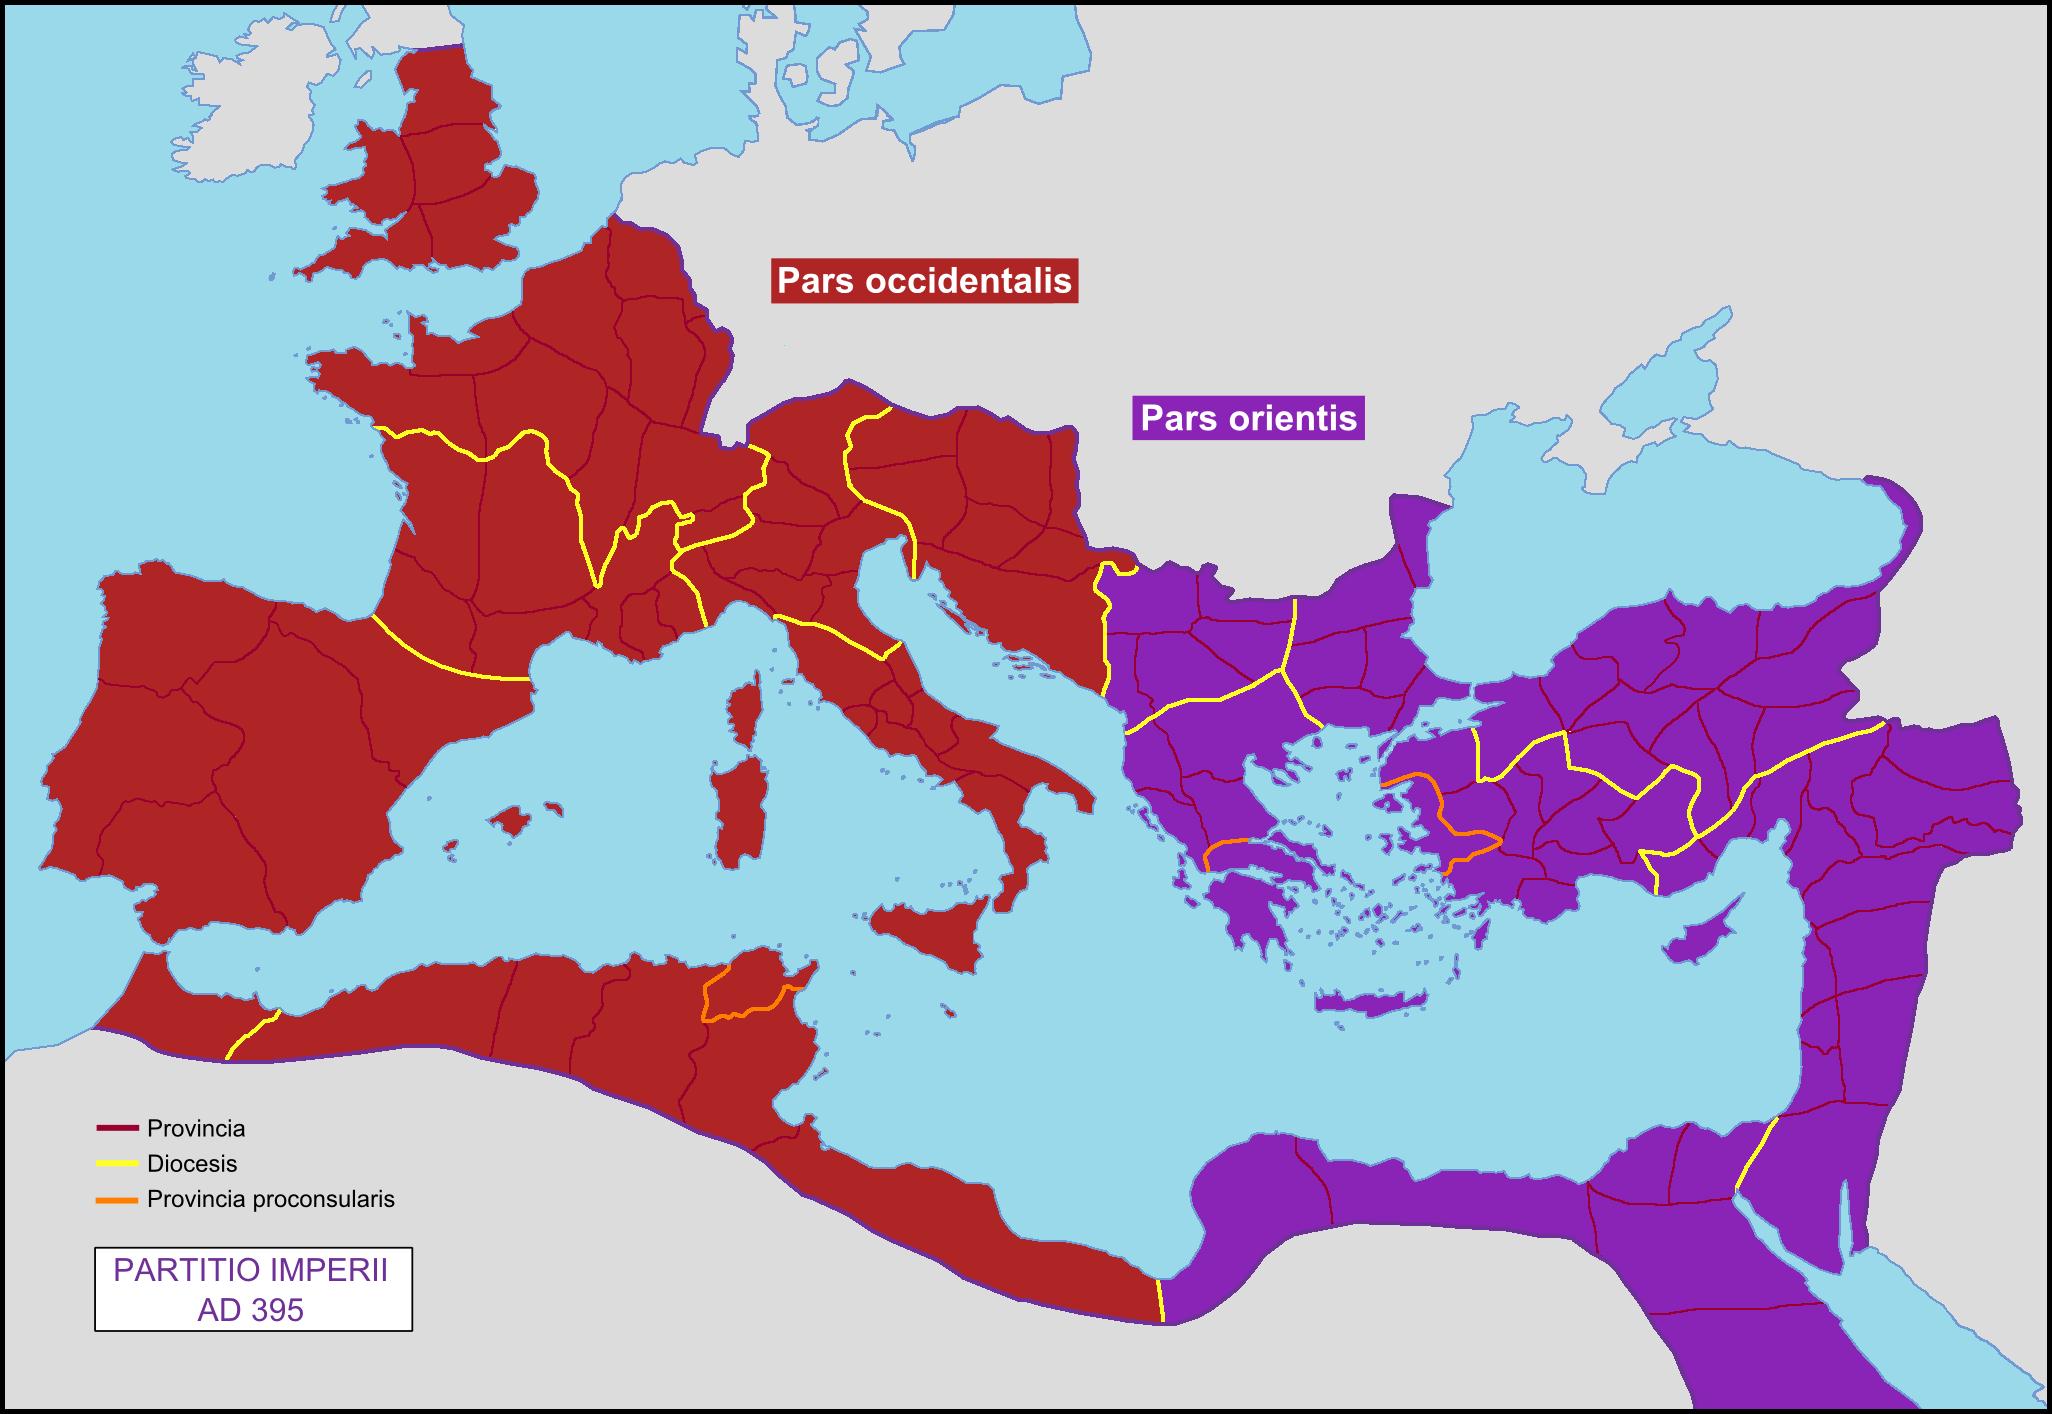 Tema Matrimonio Impero Romano : Accadde oggi gennaio d c separazione tra